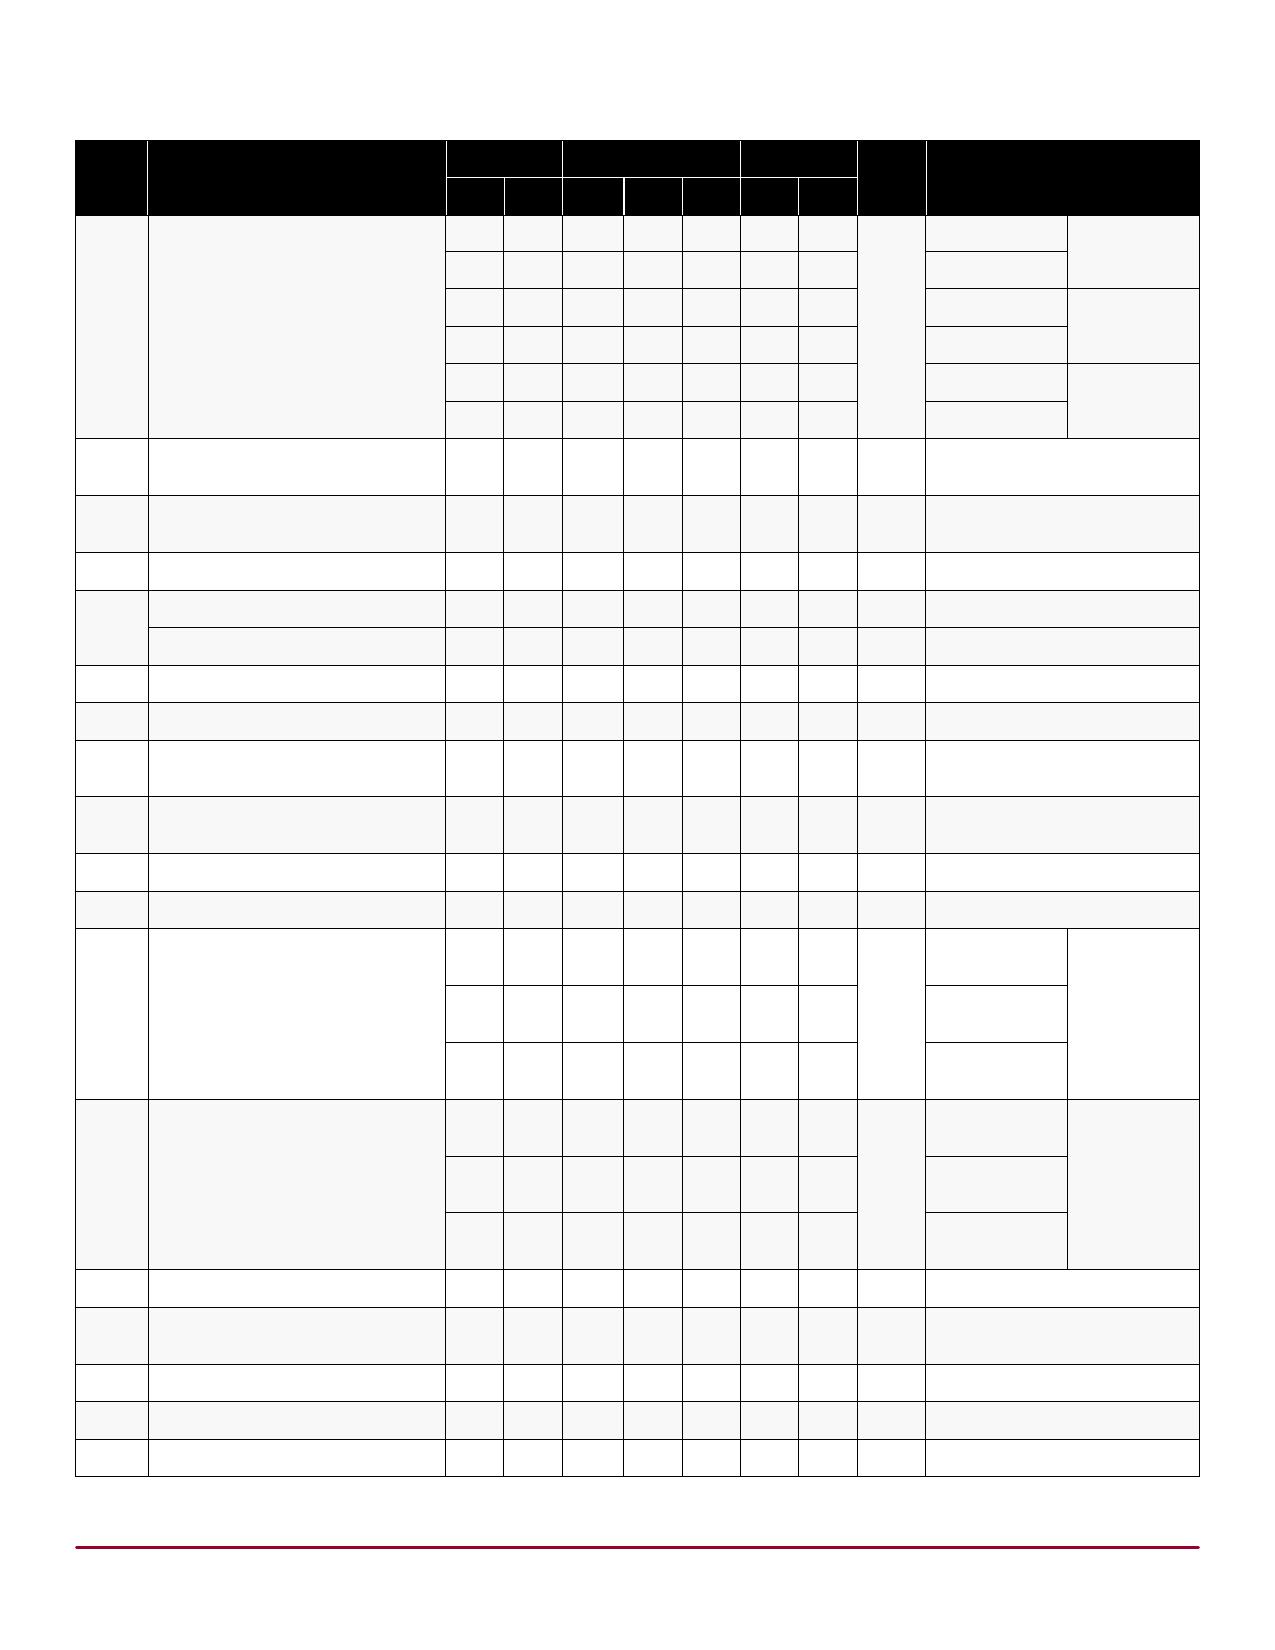 HV20320 pdf, ピン配列